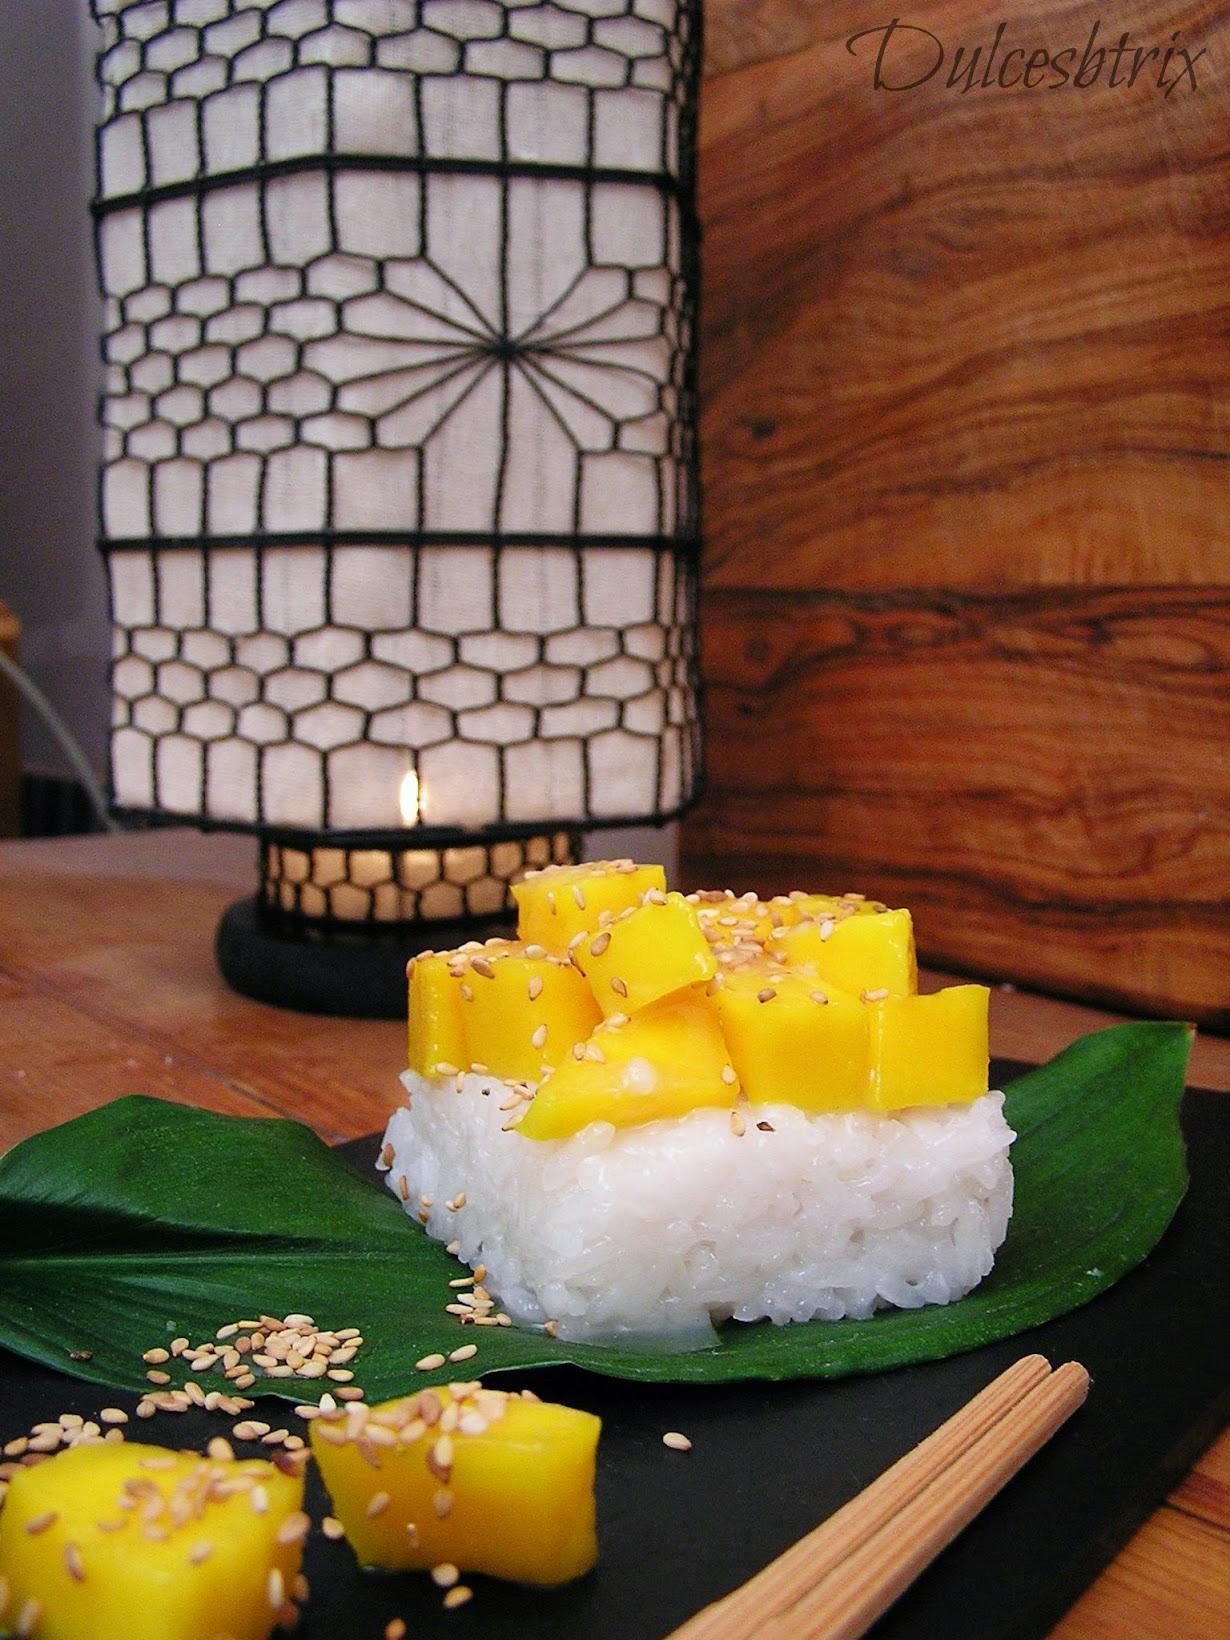 Arroz tailandés dulcesbtrix